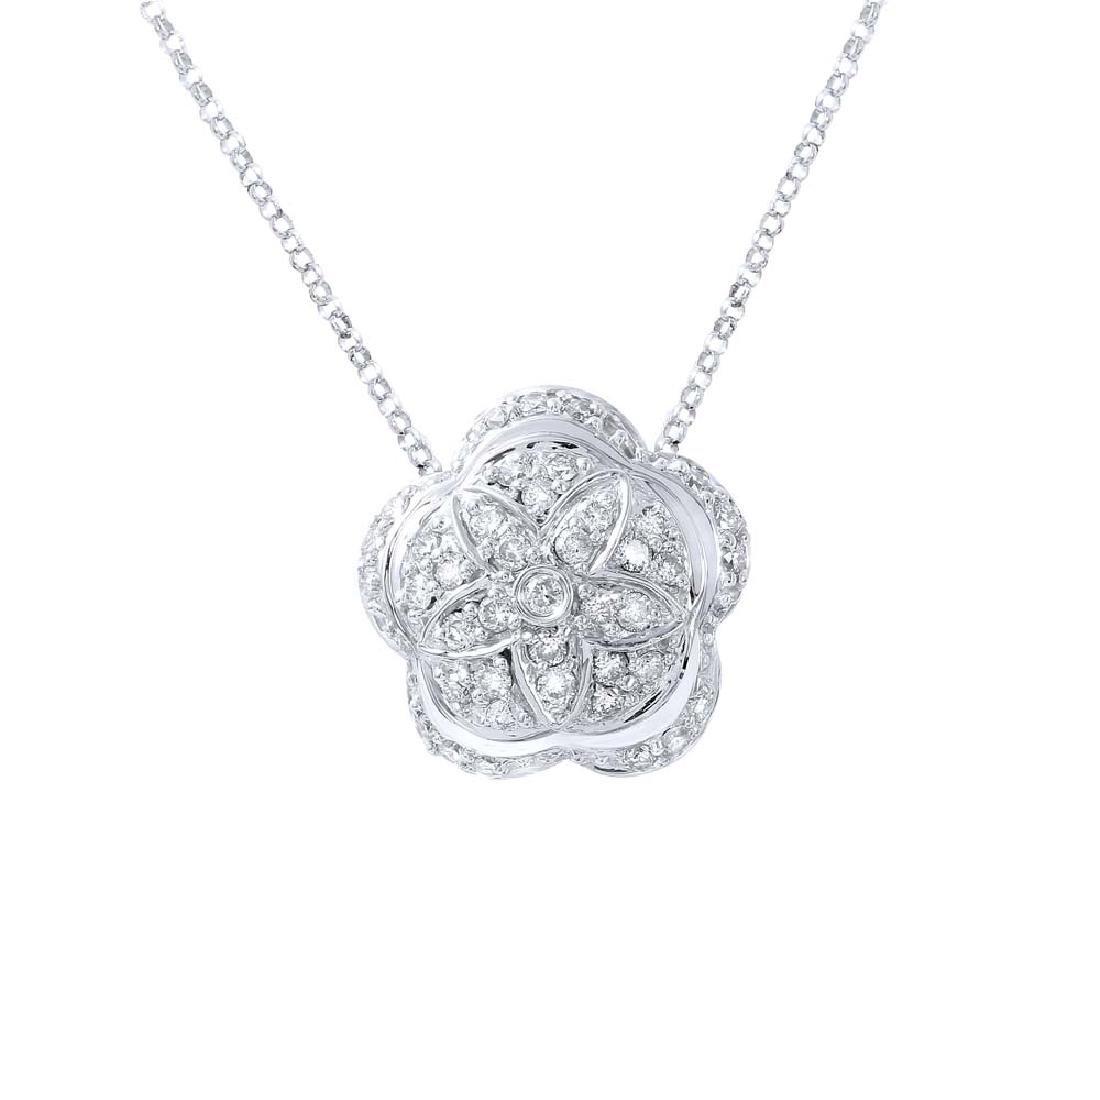 Genuine 0.8 TCW 14K White Gold Ladies Necklace